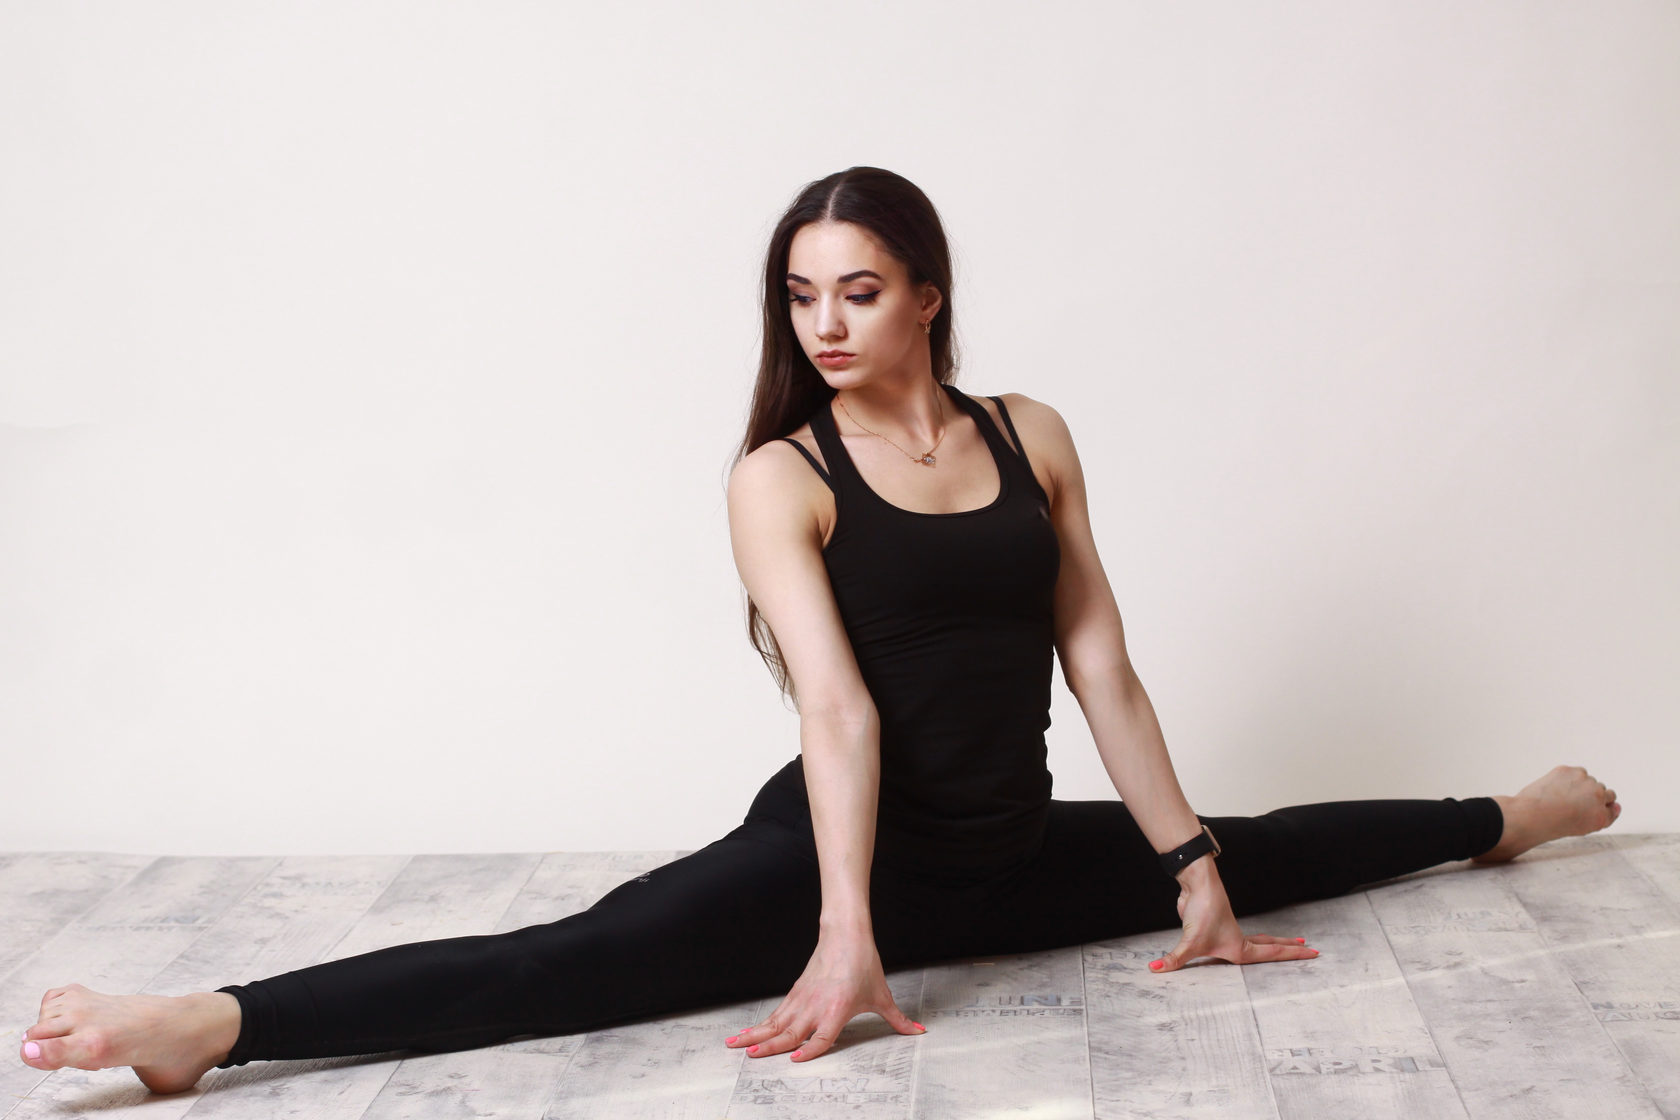 20 советов как сесть на шпагат + 19 упражнений для шпагата (фото)